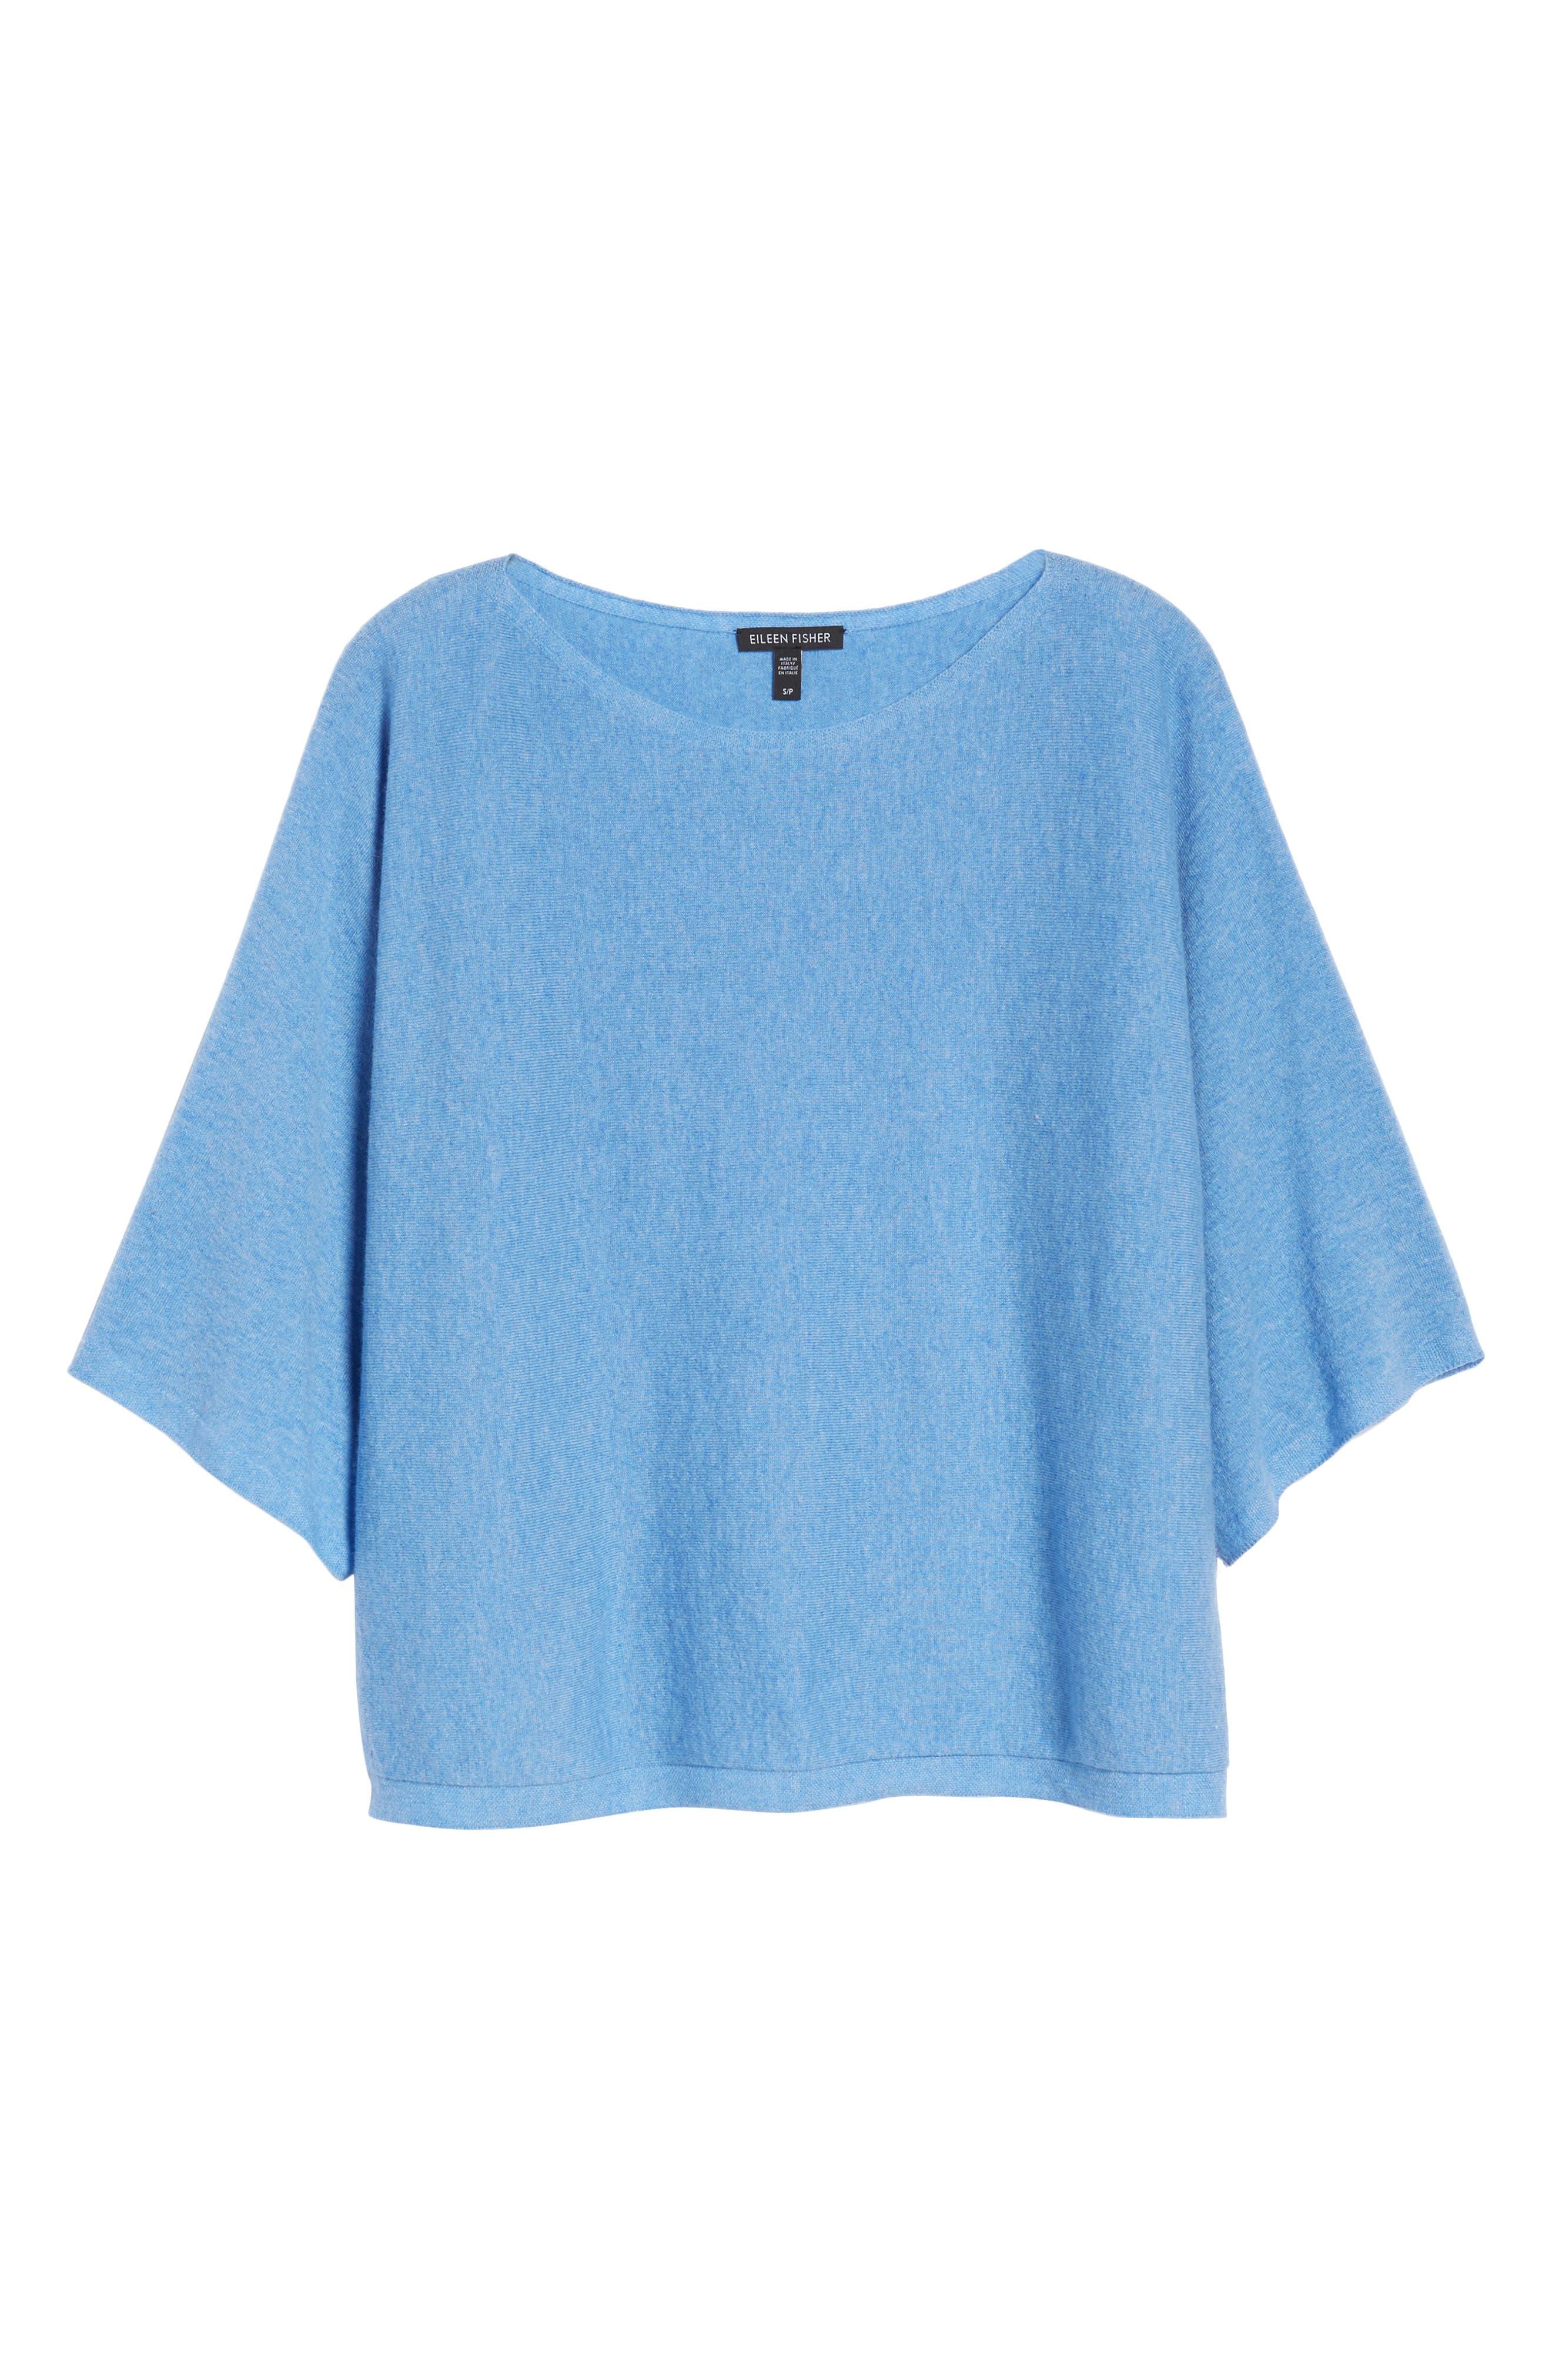 Cashmere Sweater,                             Alternate thumbnail 18, color,